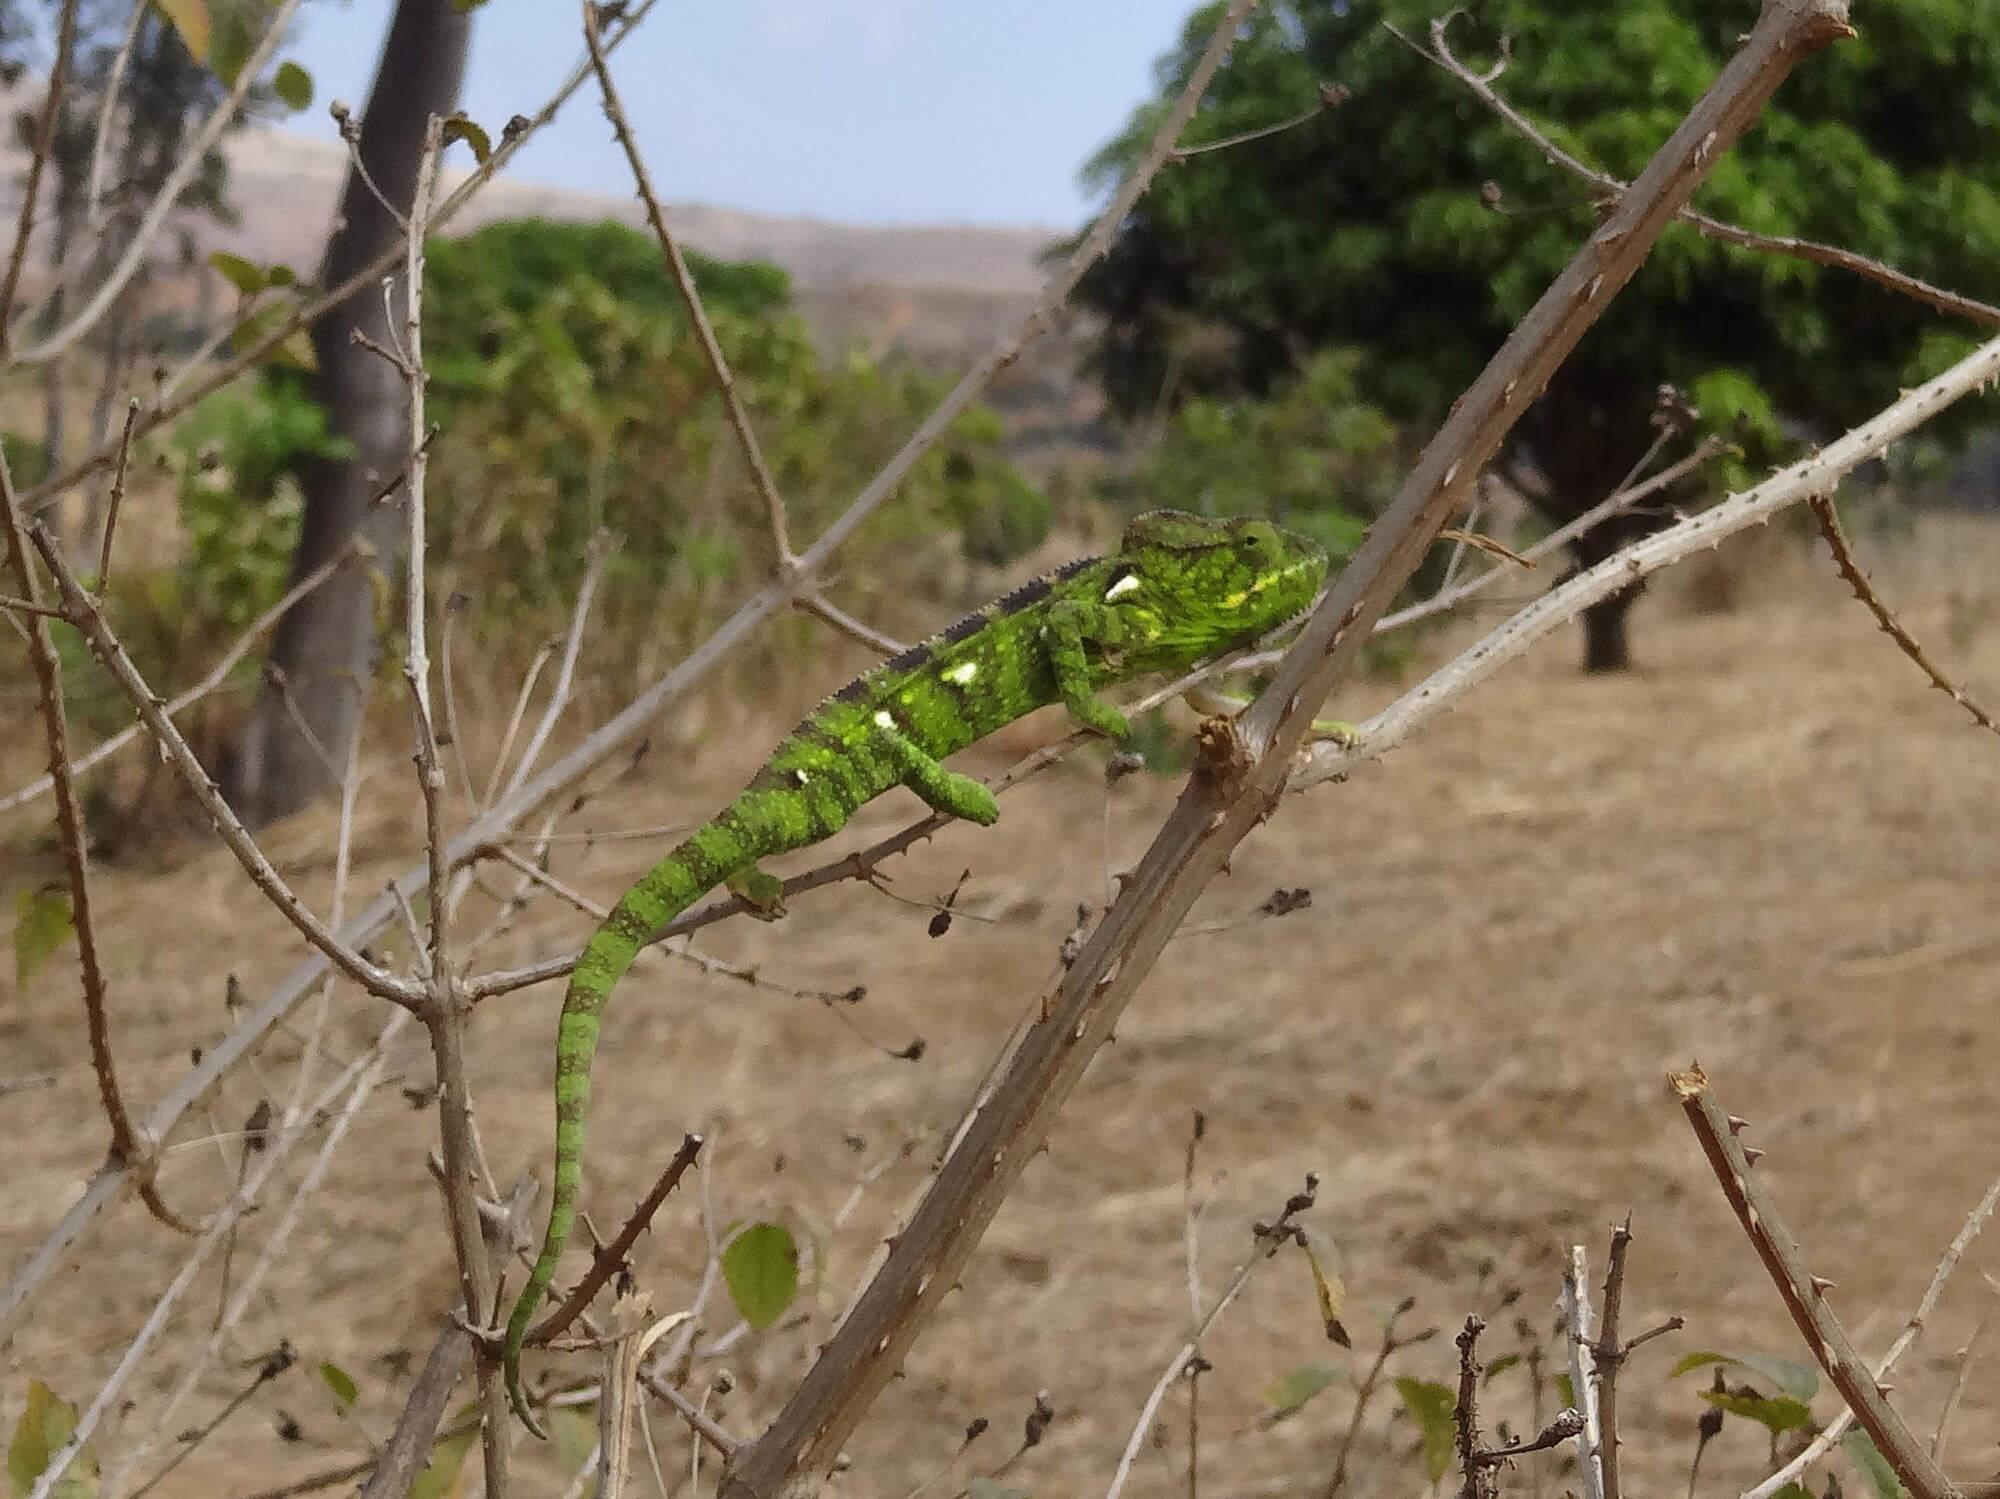 Mada017 VIAGGIO IN MADAGASCAR